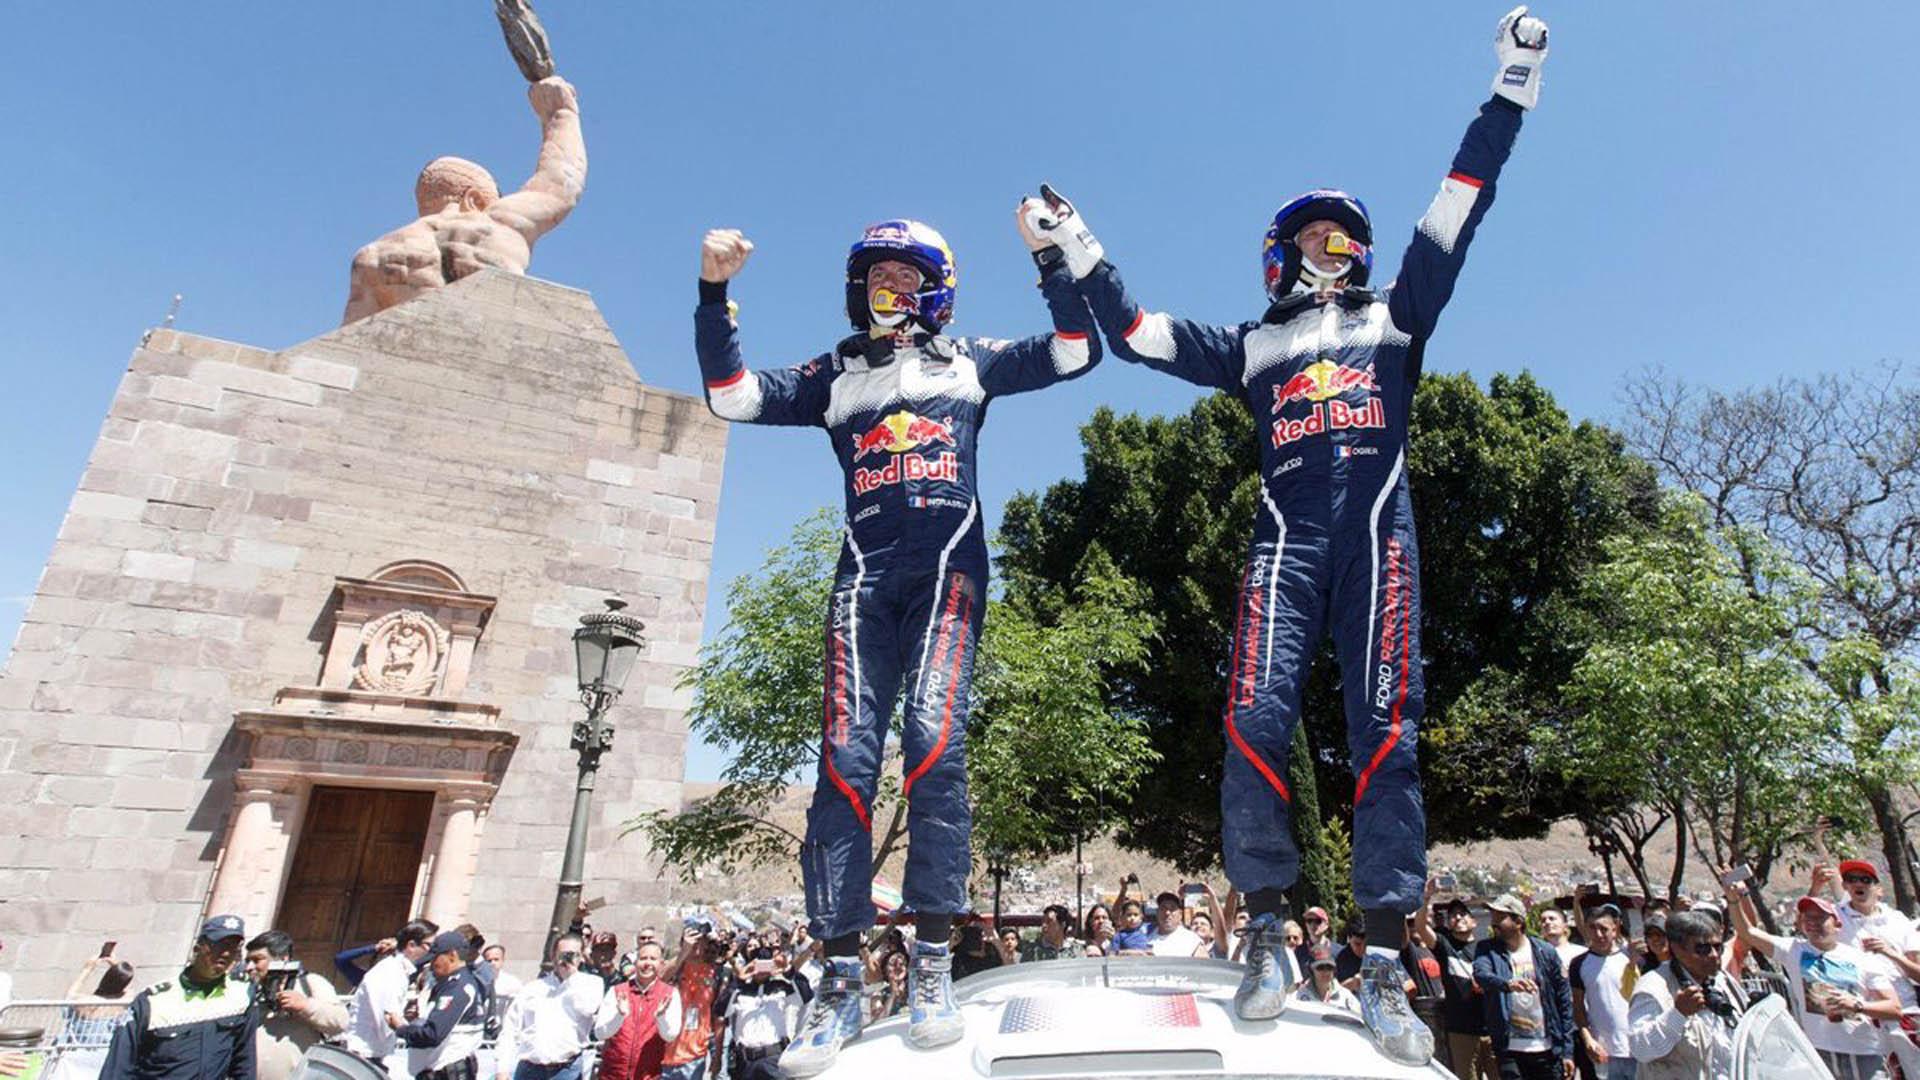 Ogier gana el Rally de México y Sordo queda segundo